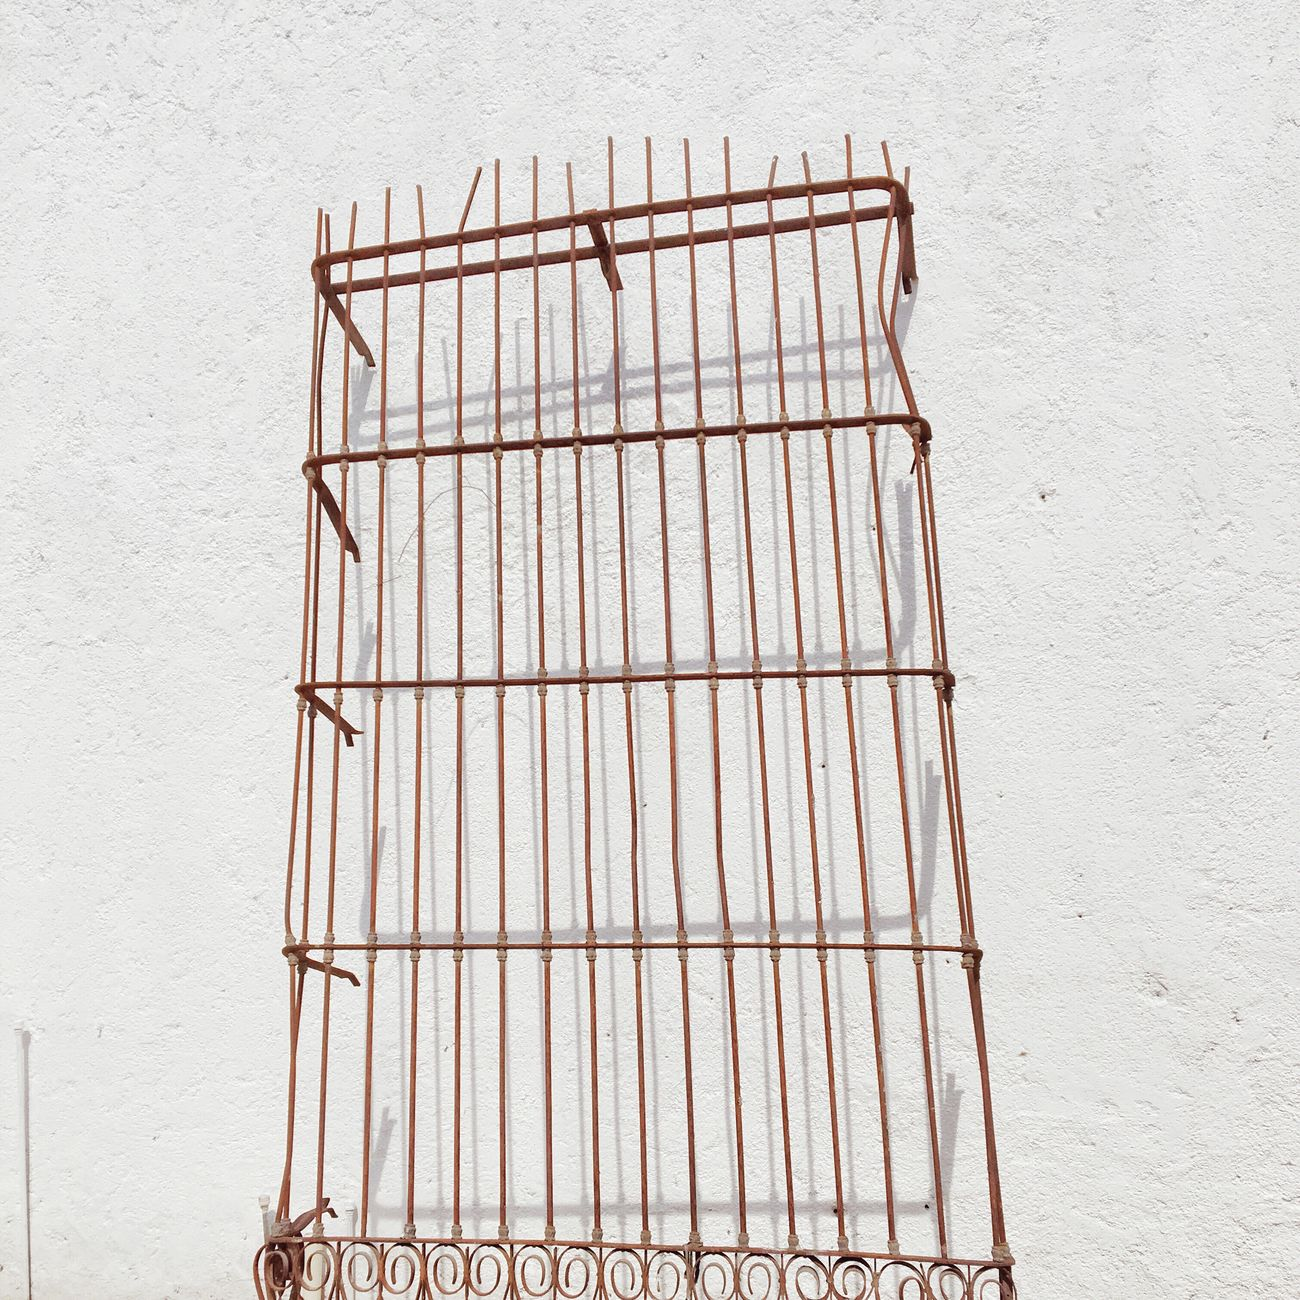 Fence Architecture Window IPhoneography Minimalism White